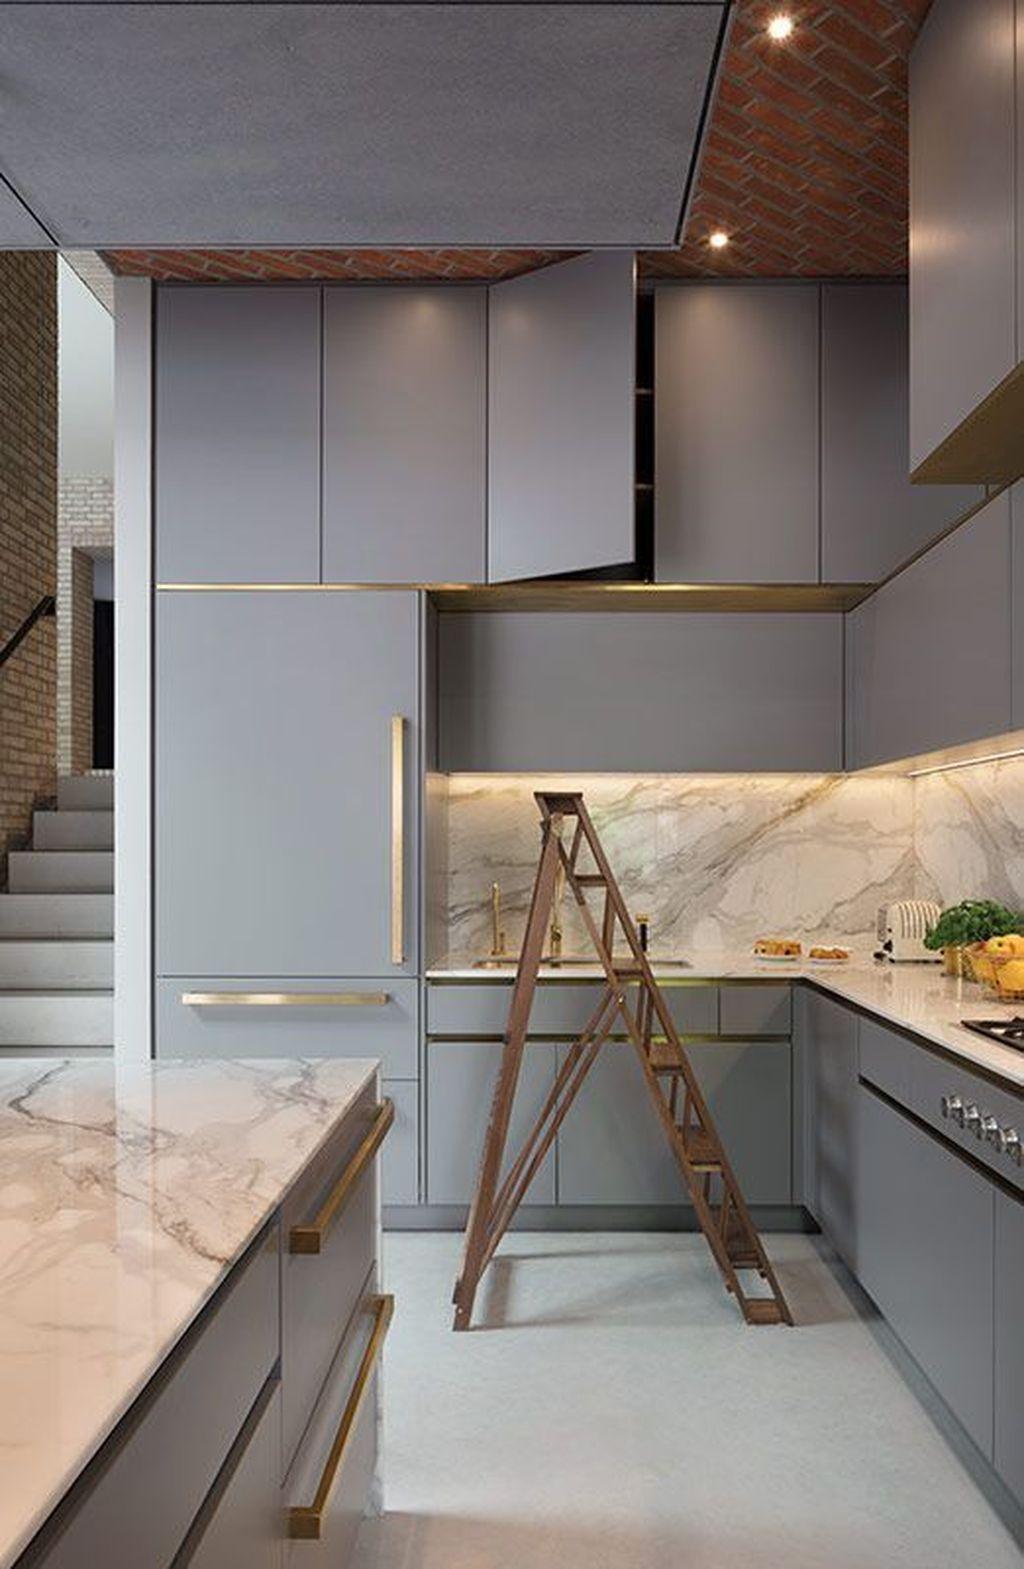 Simple Metal Kitchen Design49